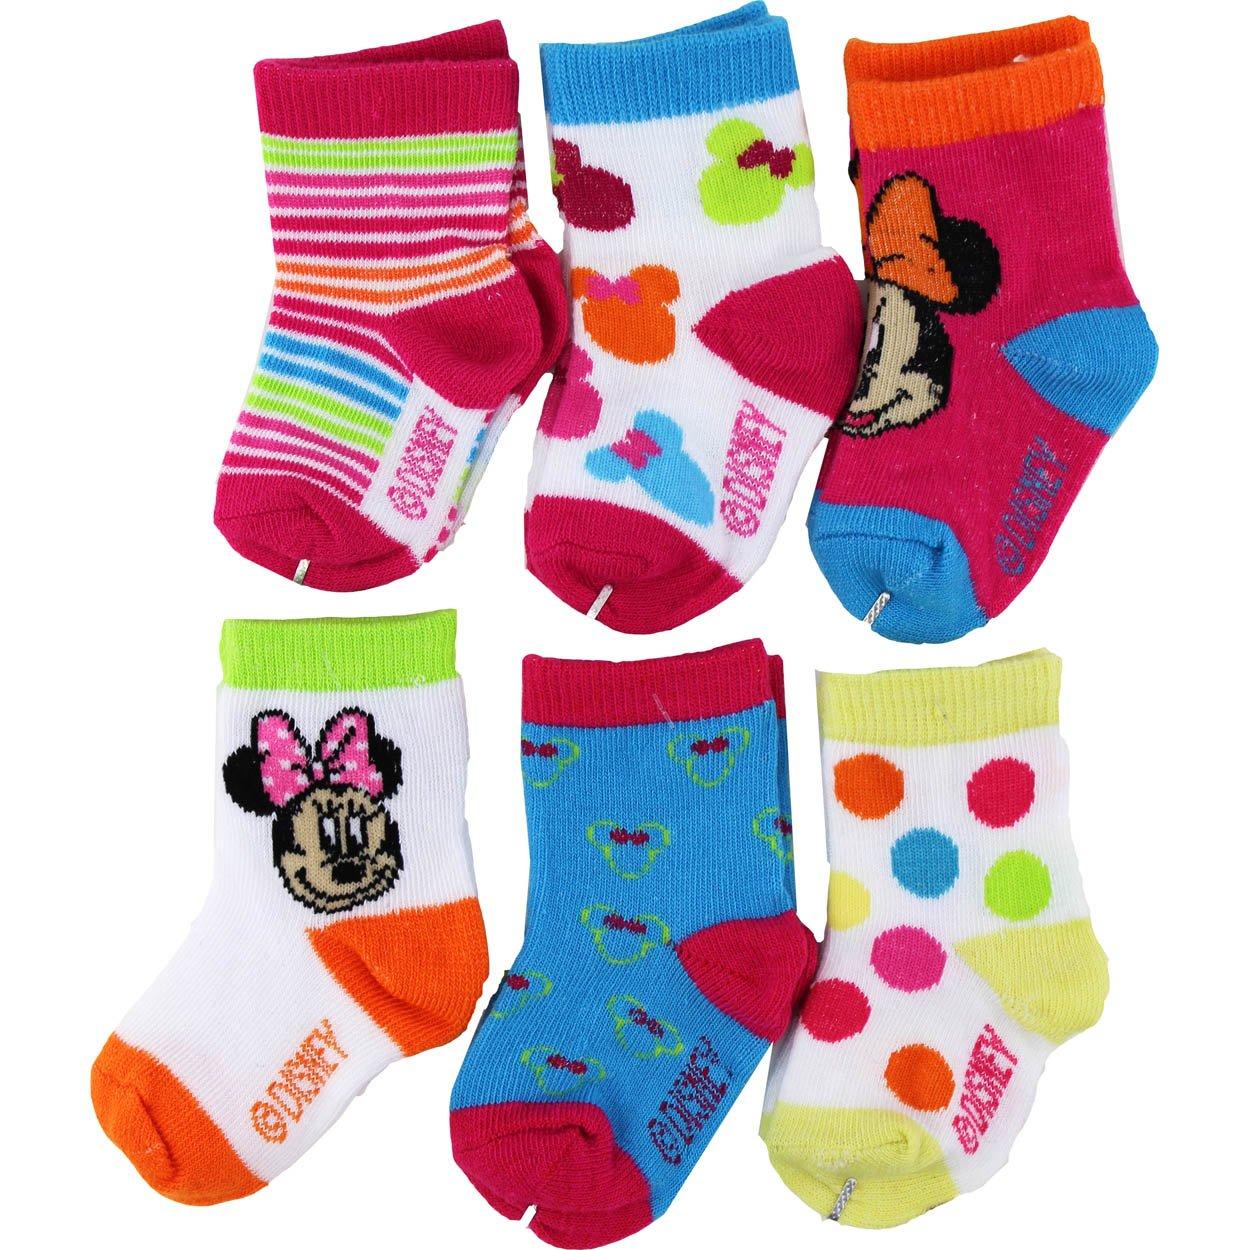 "Товар для детей Disney Minnie Mouse ""All Things Minnie"" 6-Pack Infant Crew Socks"